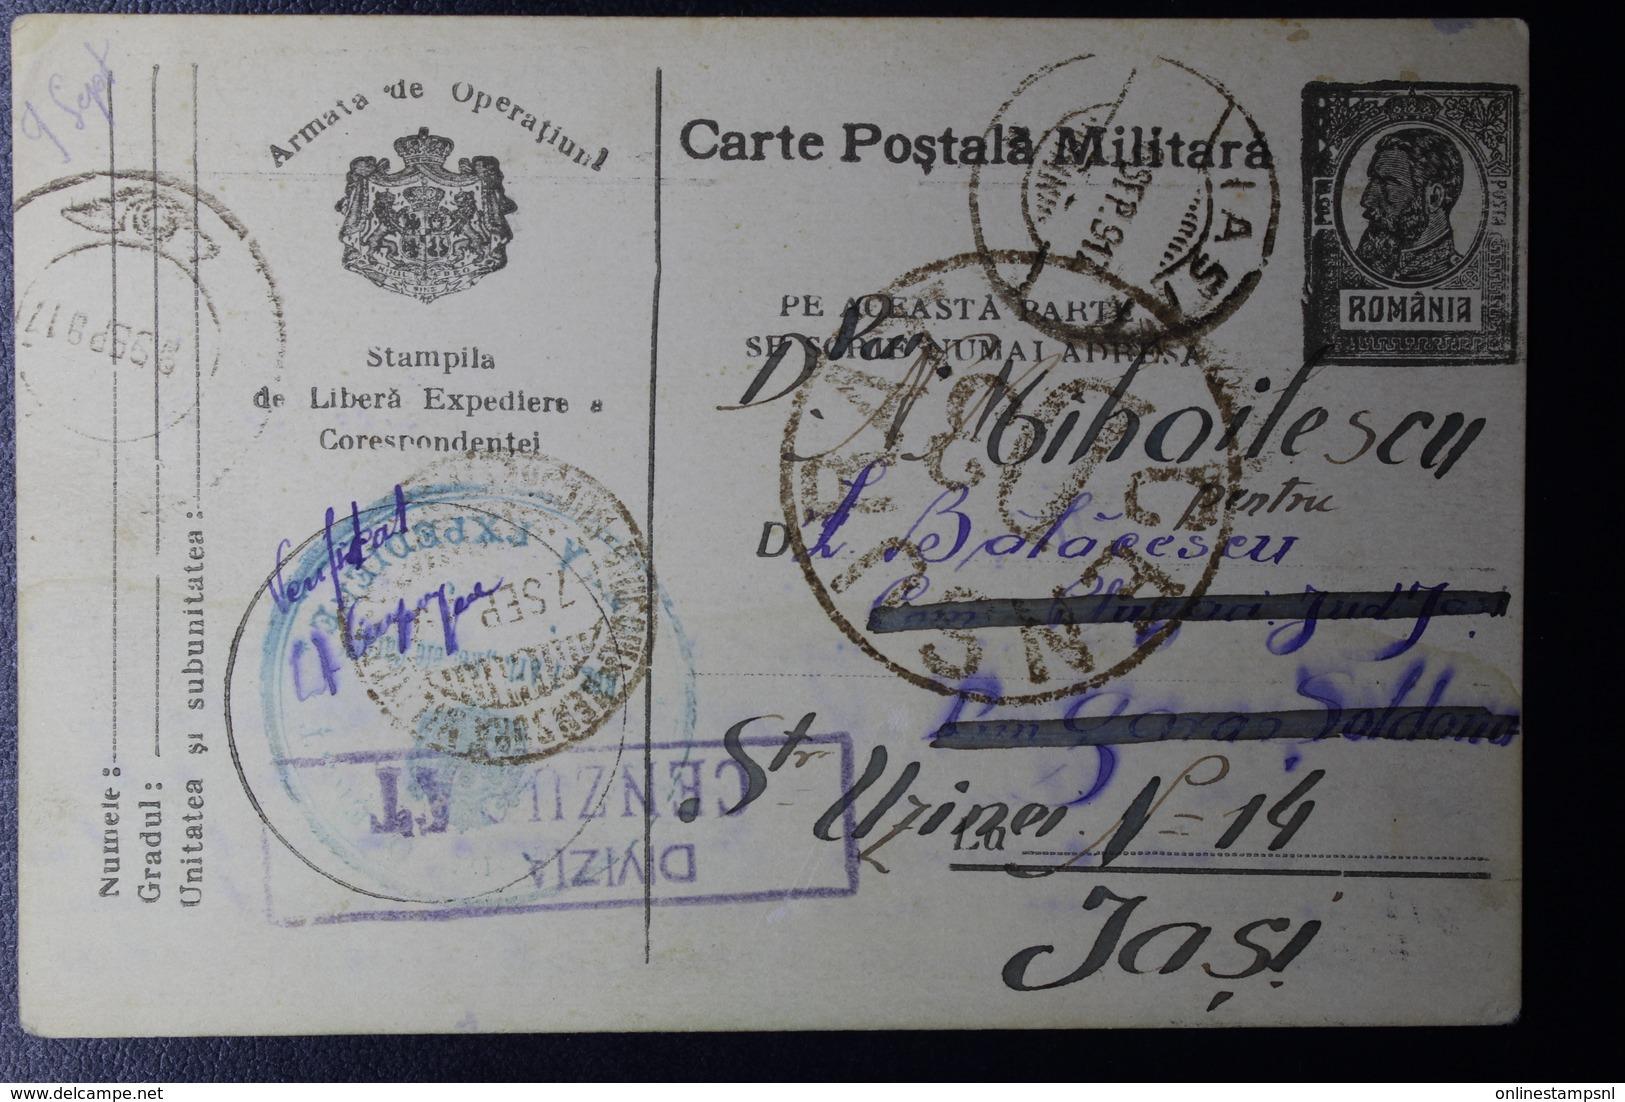 Romania Varte Posta Militaira 1917 Feldpost Blue Frank Cachet 3 Various Censor Cachets To Soldana Forwarded To IASI - 1ste Wereldoorlog (Brieven)